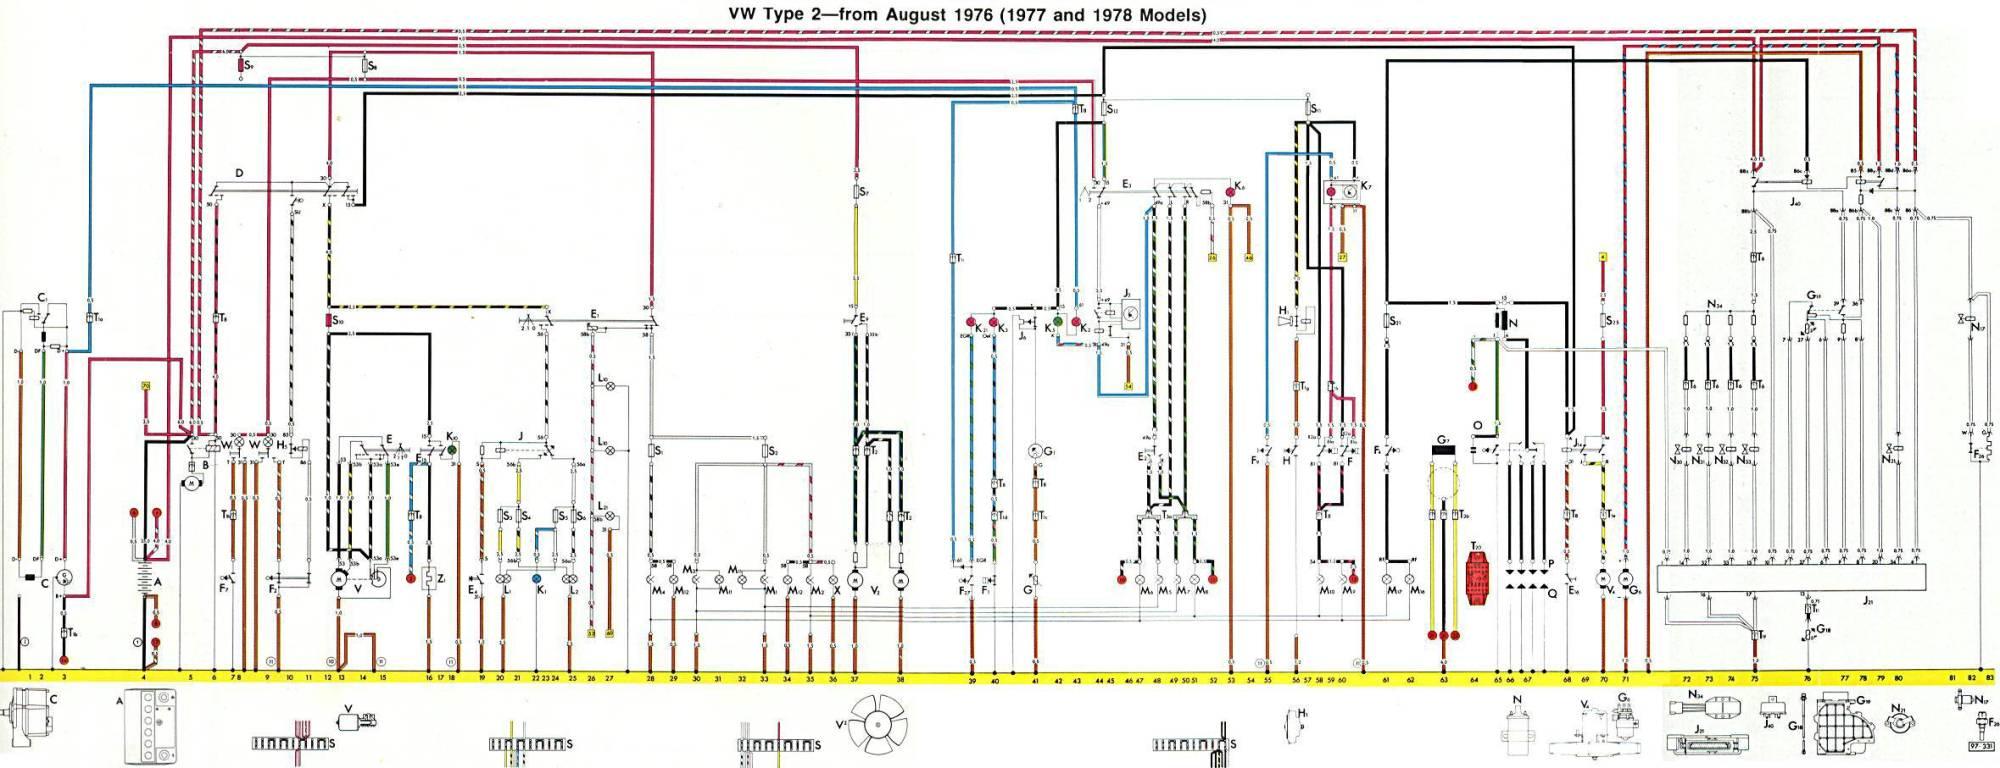 hight resolution of 1977 vw wiring diagram everything wiring diagram 1977 vw bus wiring diagram wiring diagram 1977 vw